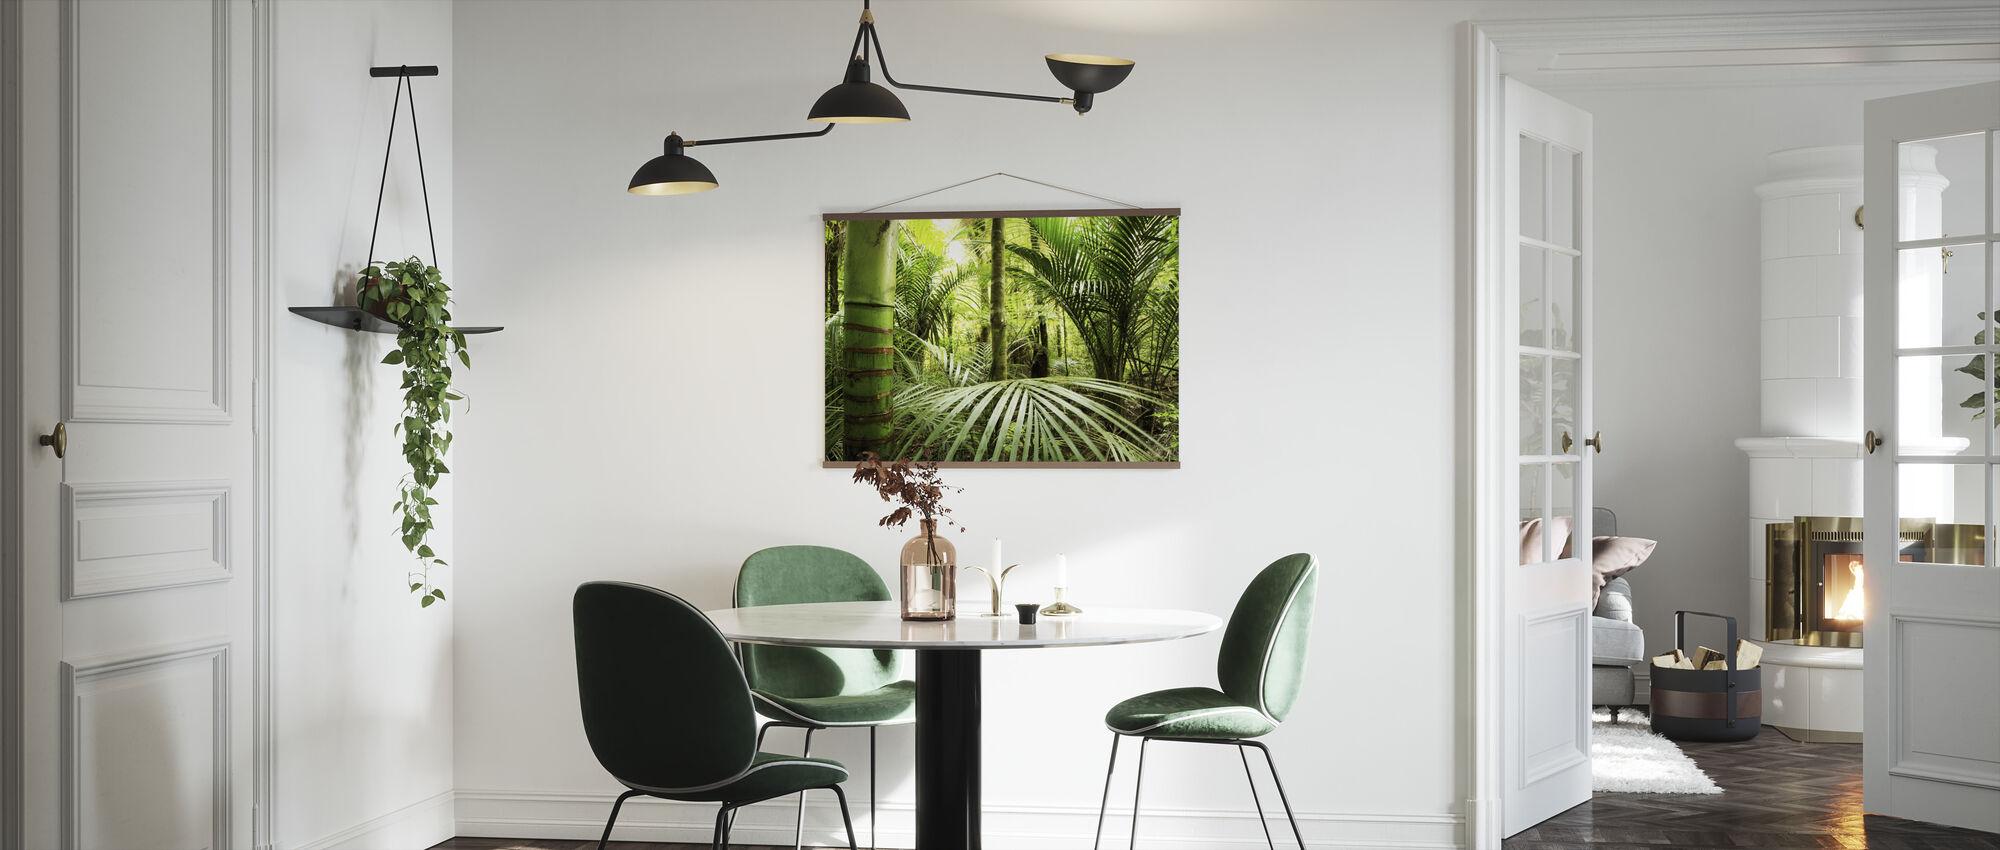 Vegetation - Poster - Kök